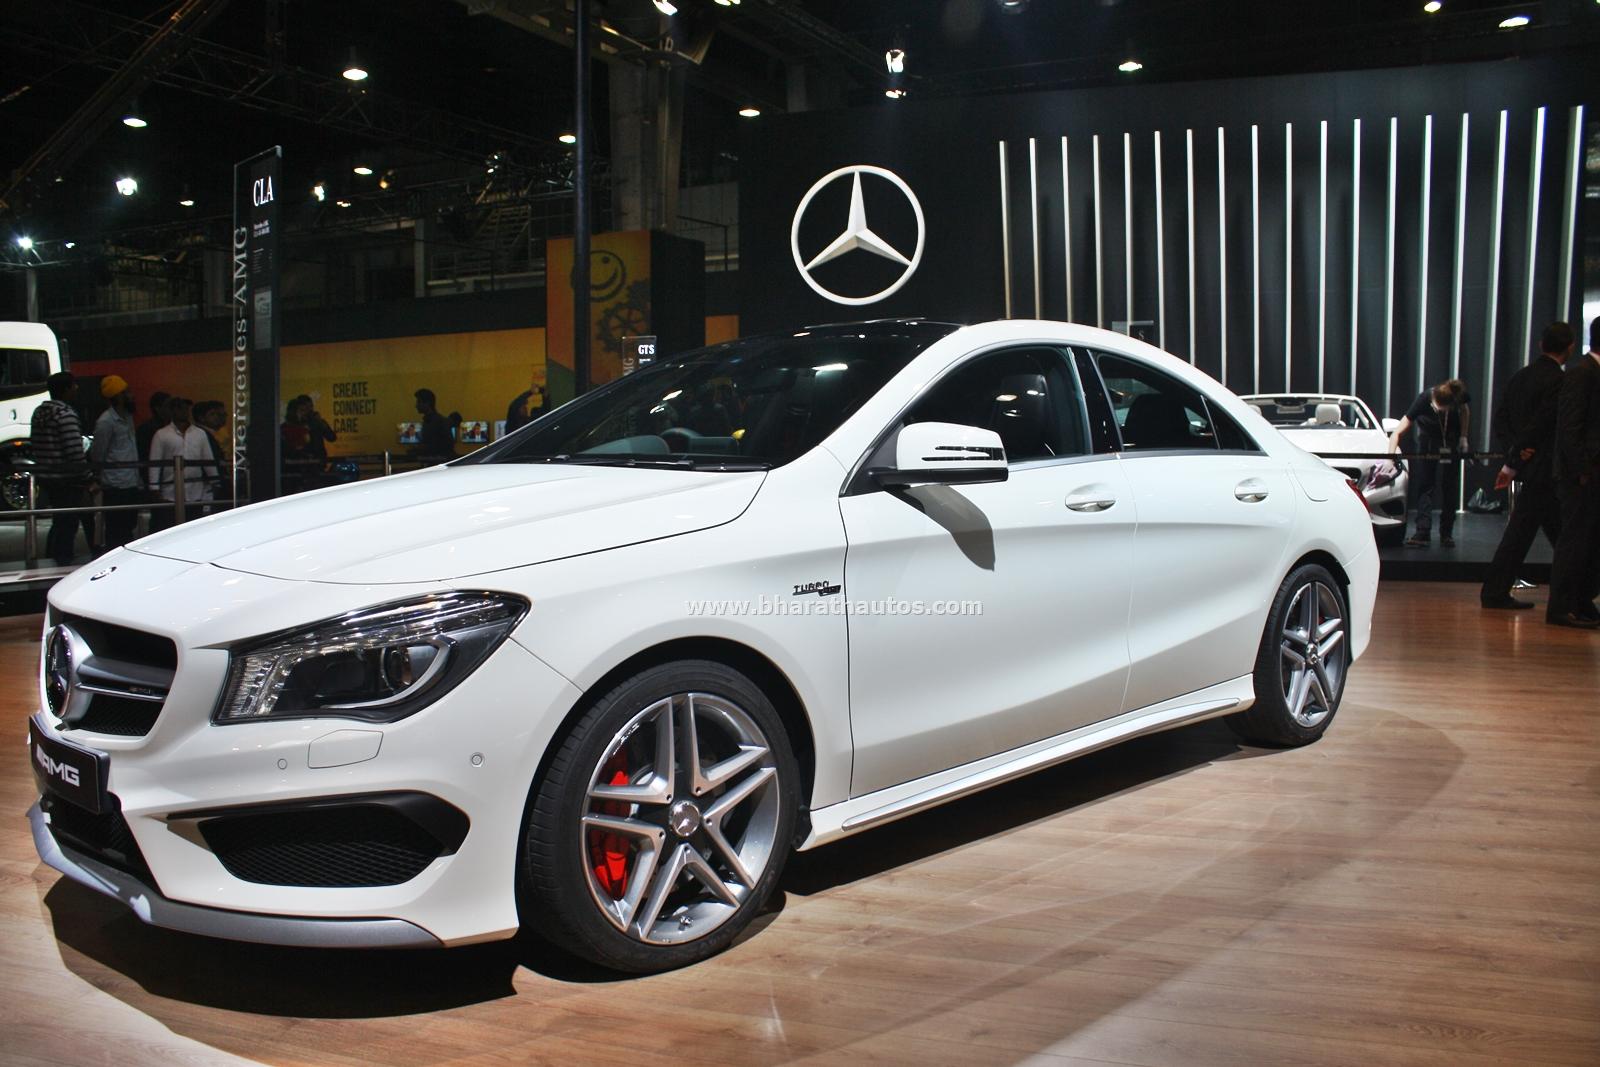 Mercedes Cars At Auto Expo 2016 Mercedes Benz At Delhi: Mercedes-Benz Cars At The 2016 Indian Auto Expo